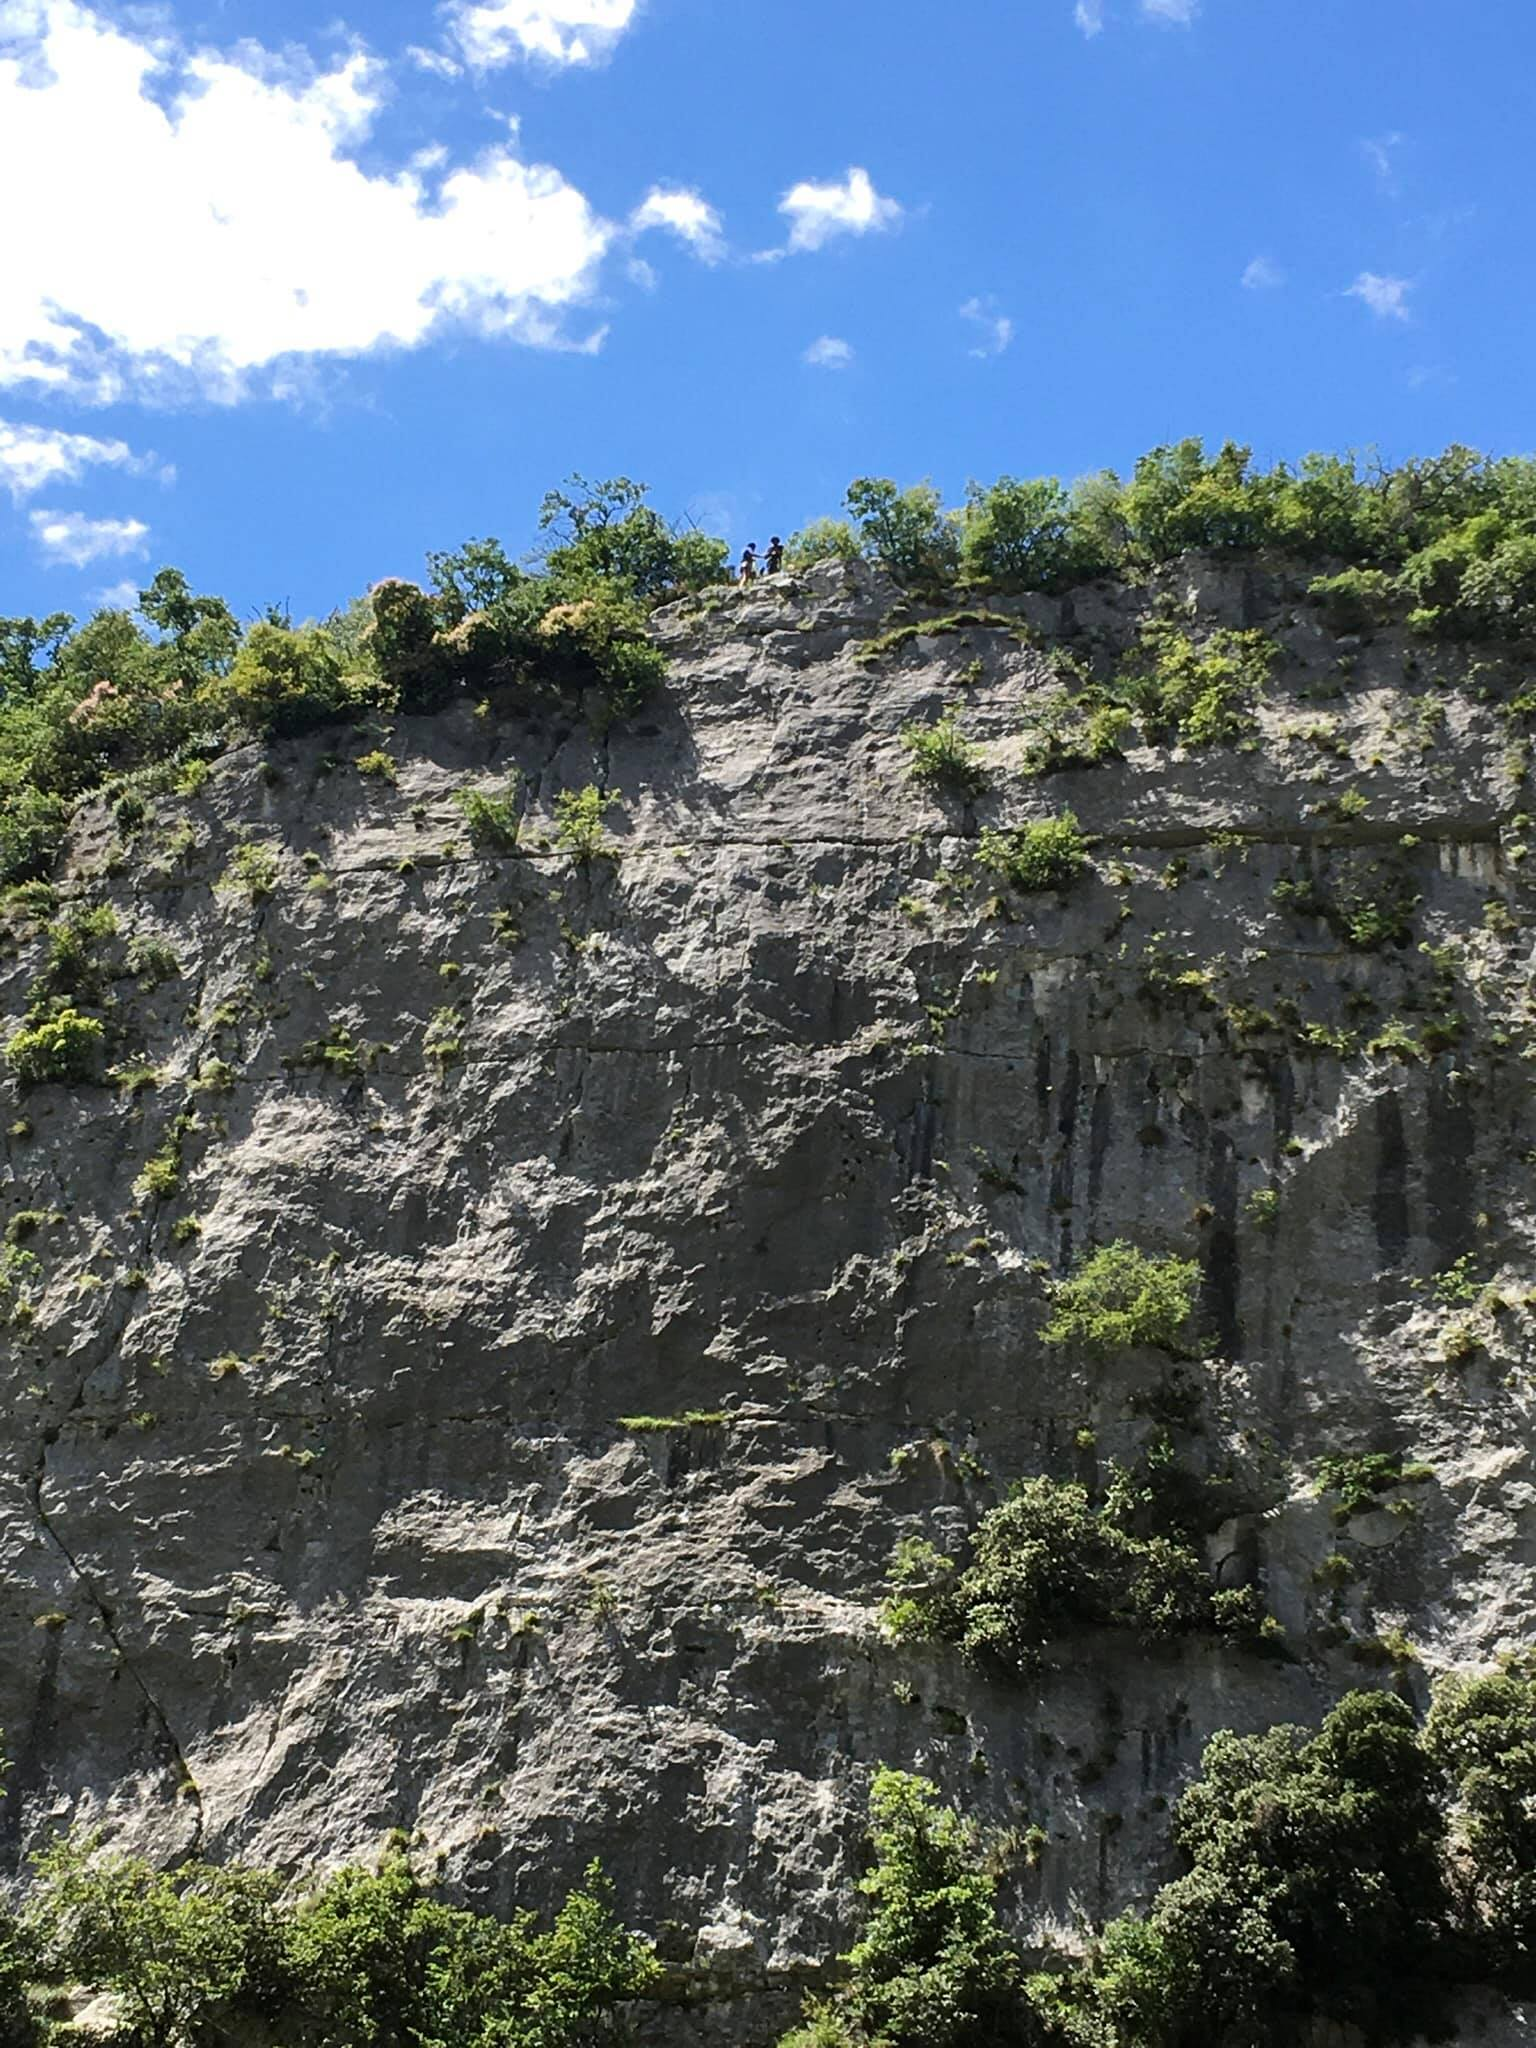 Raft'n'Climb Val d'Adige caput mundi Rafting + ferrata + vuoto cosmico = super ...